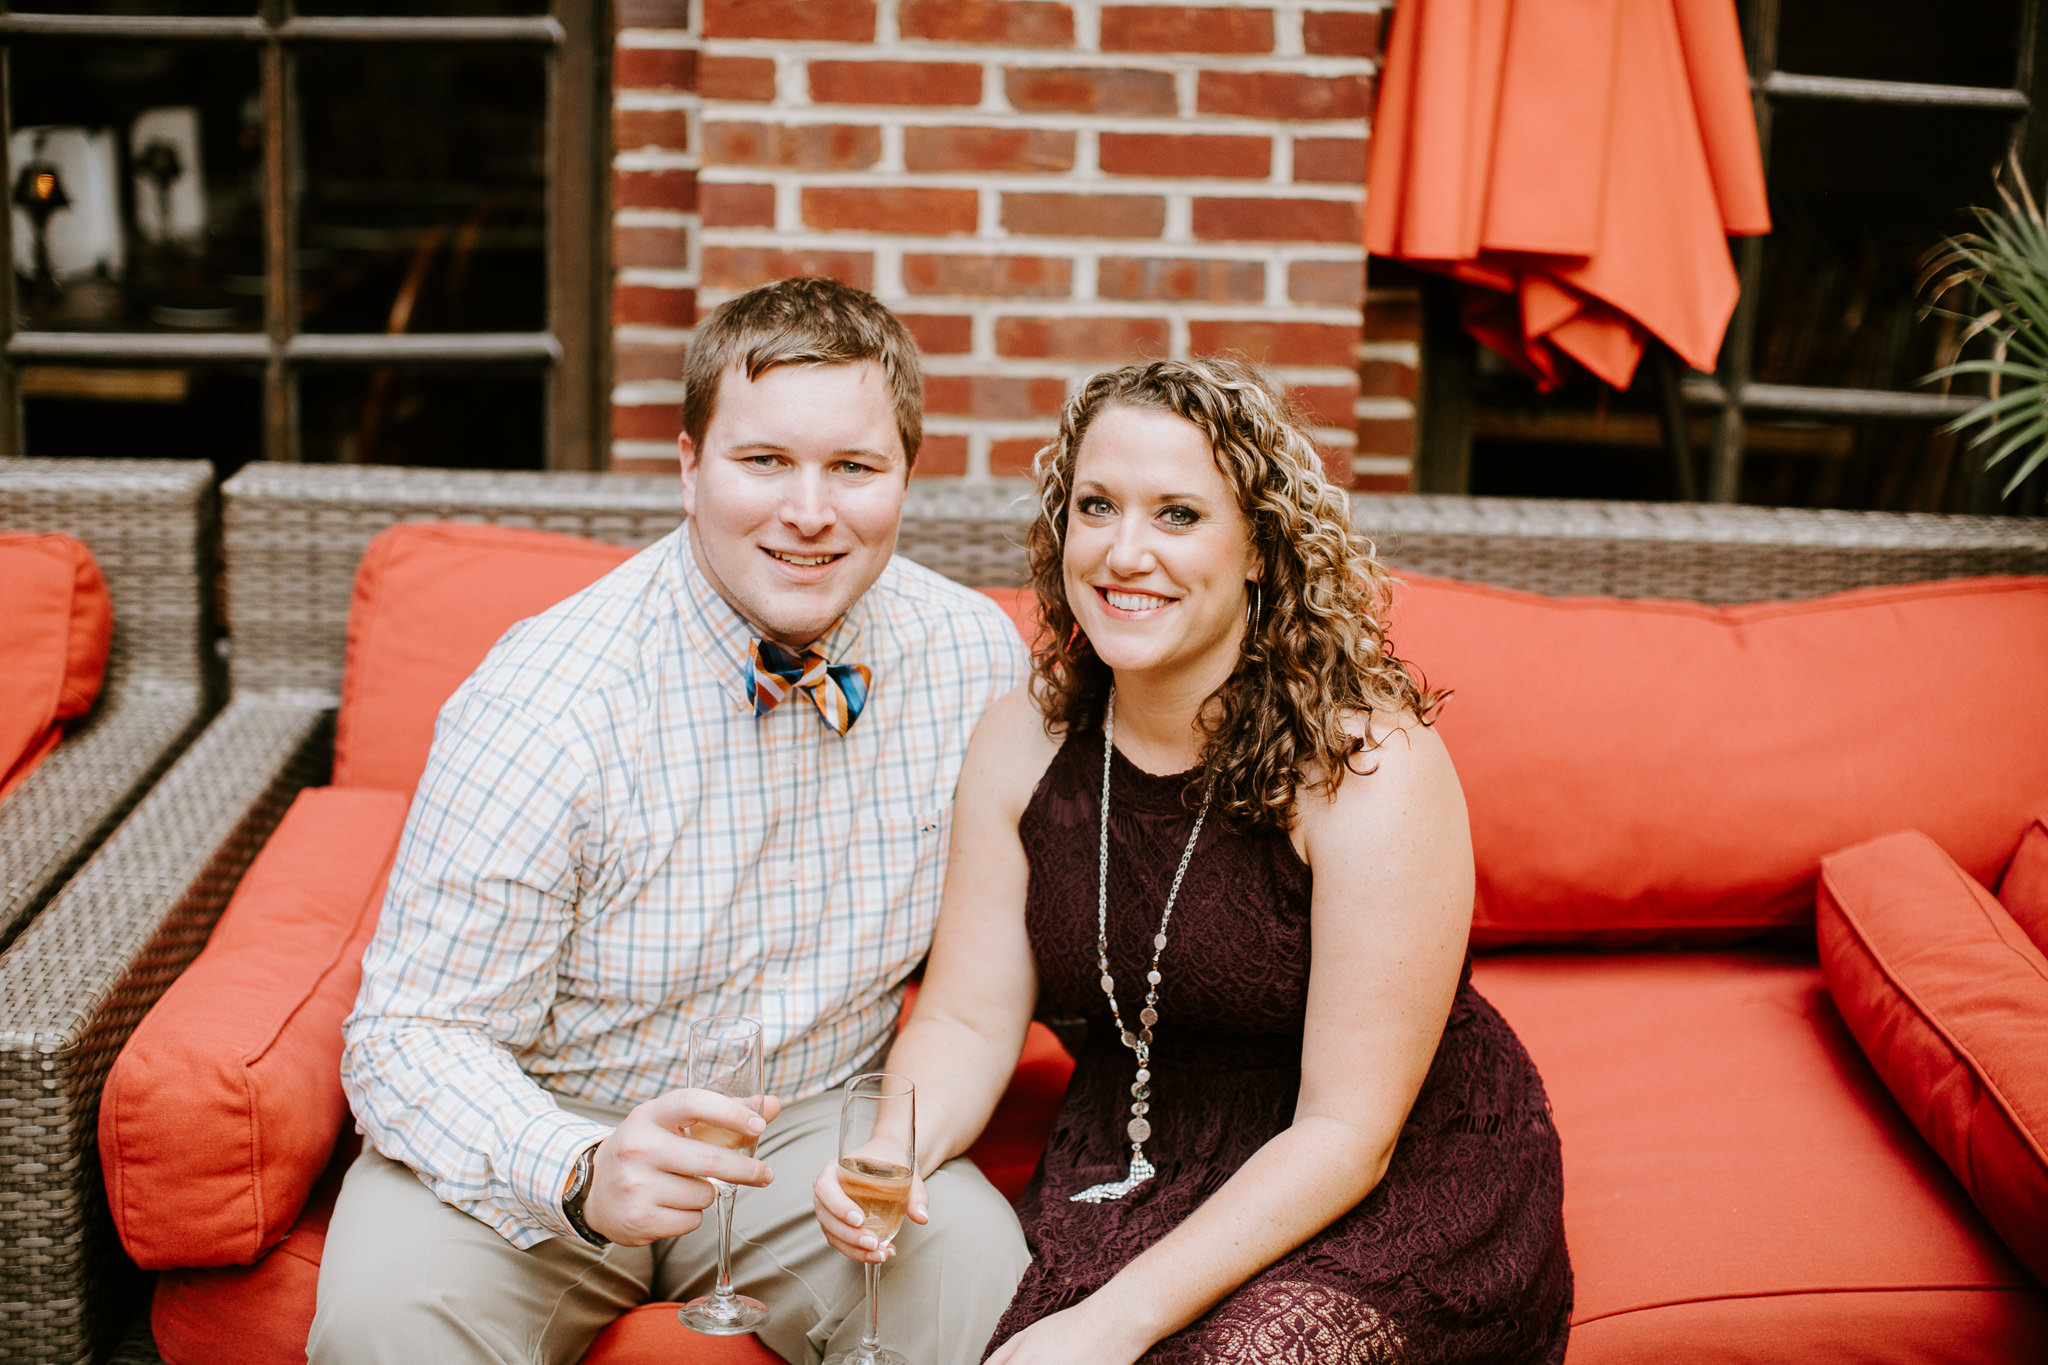 Roanoke - Engagement- Virginia wedding photographer - Pat Cori Photography-5.jpg